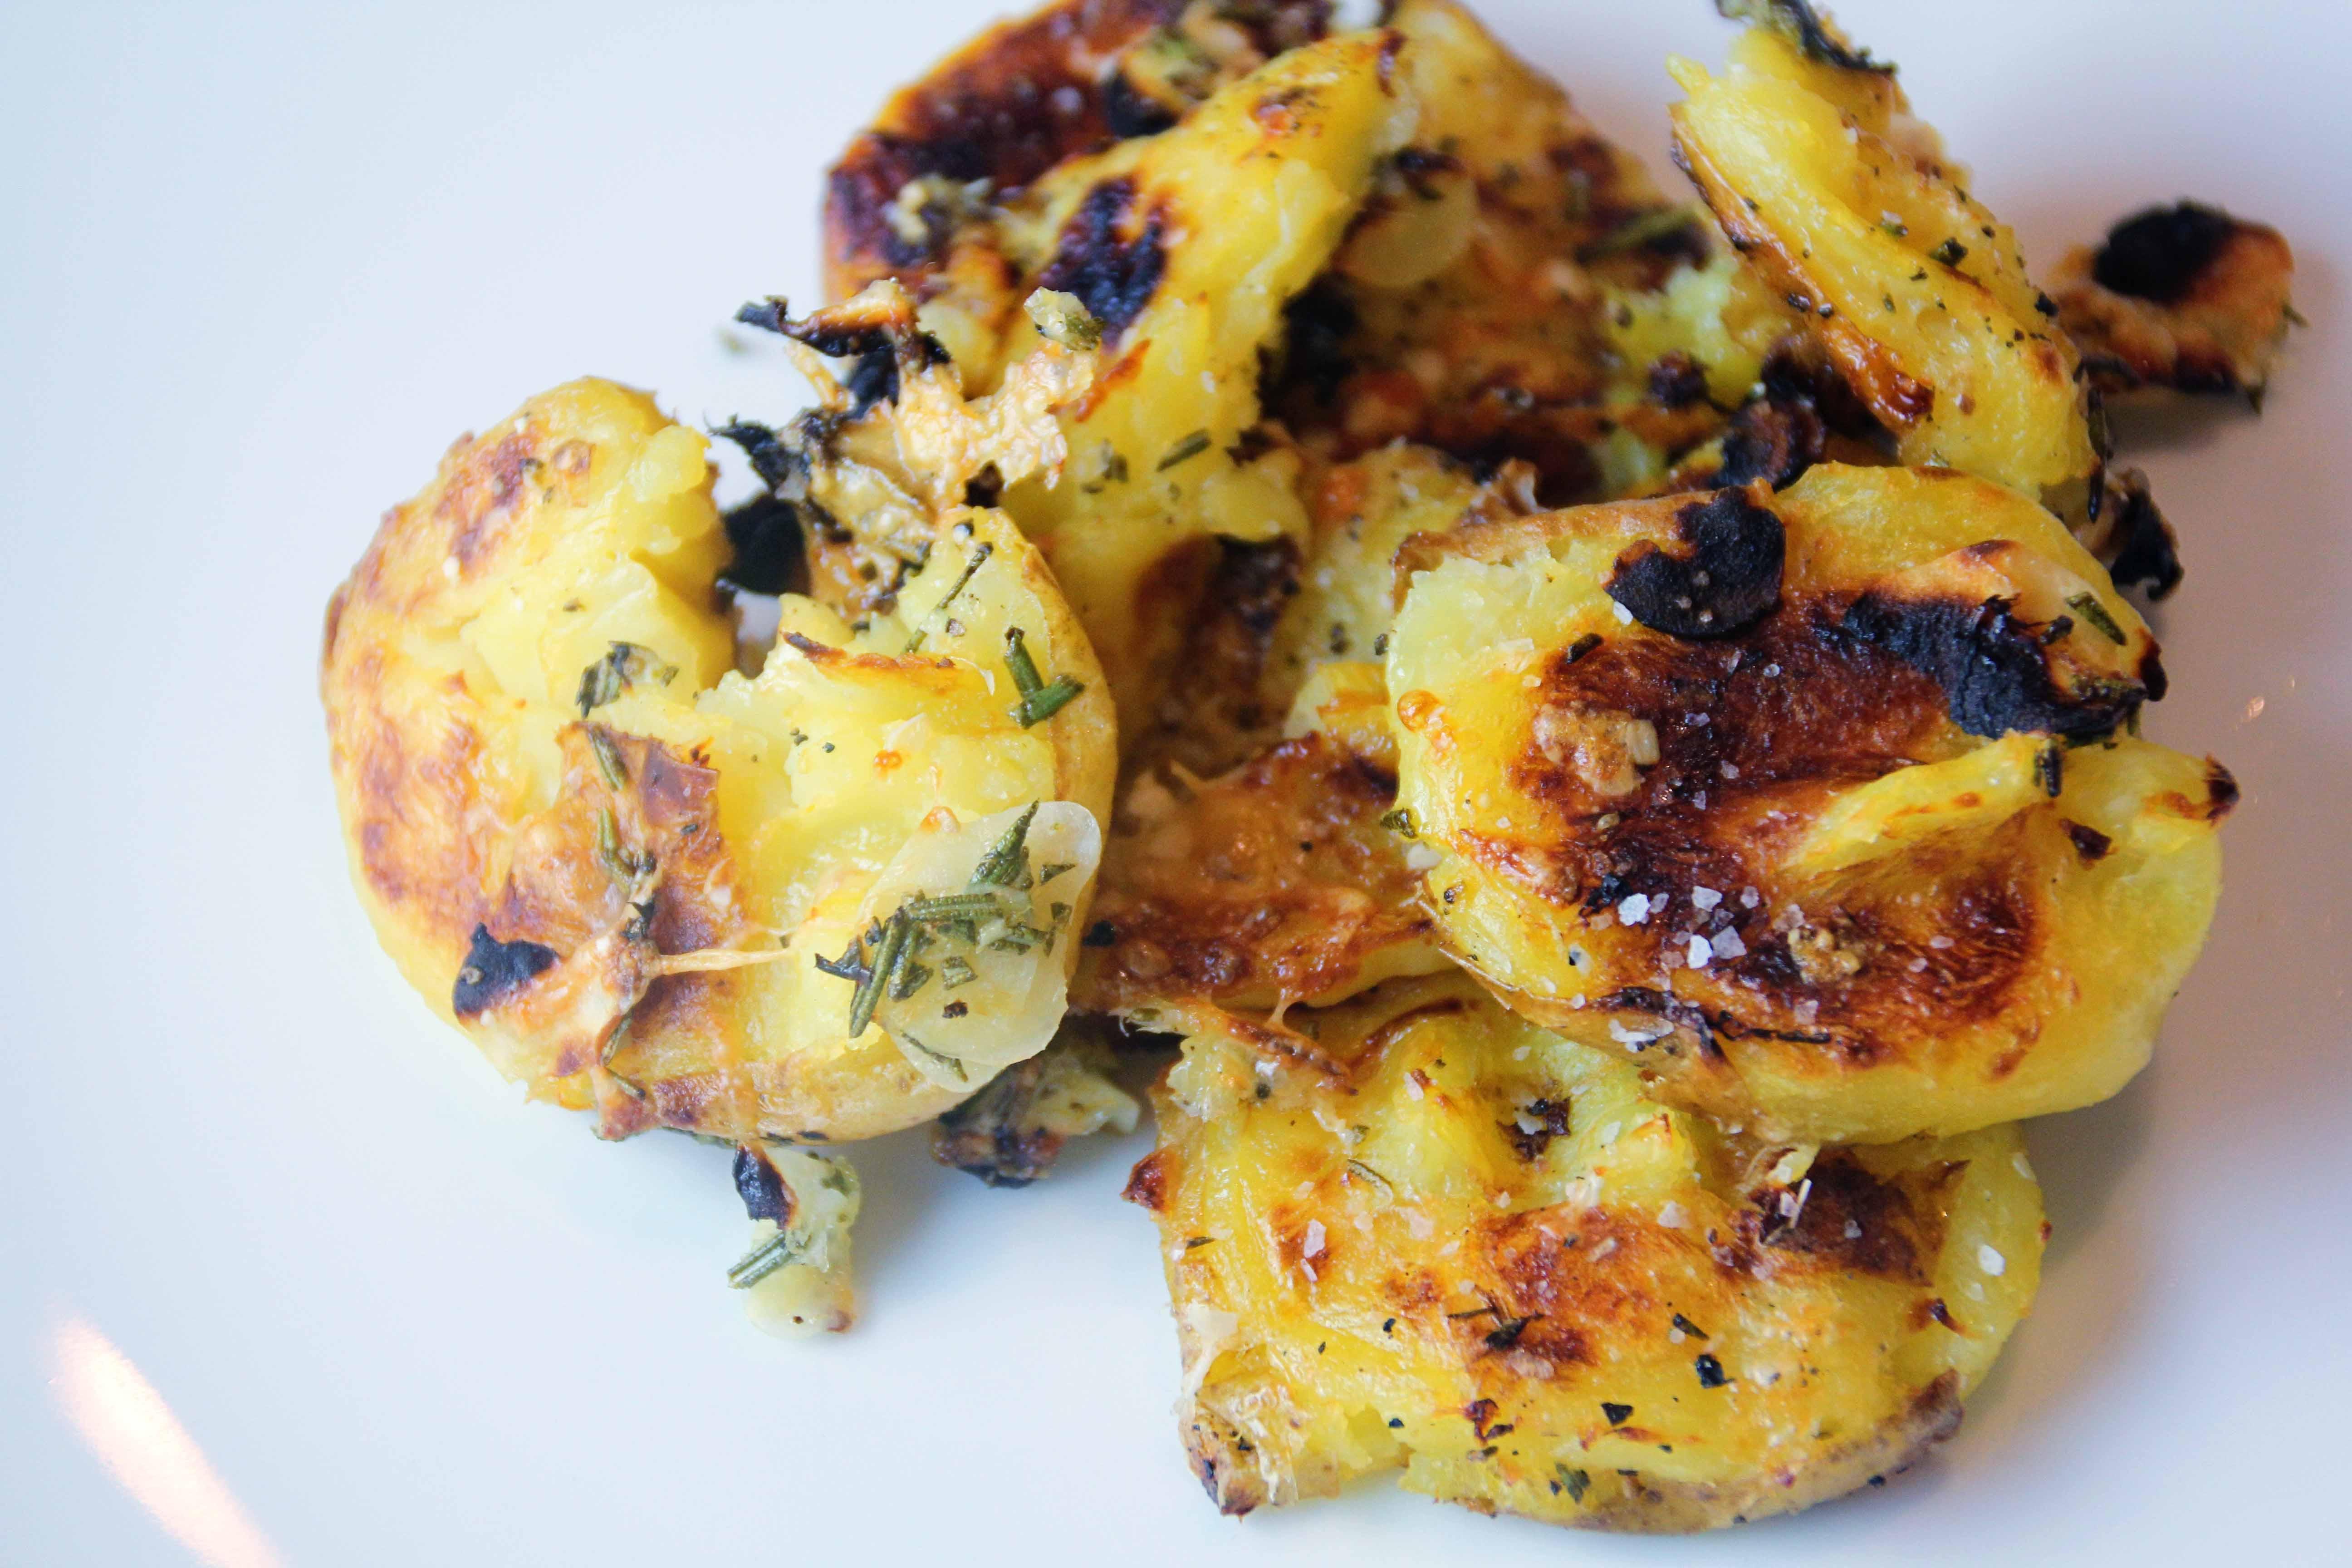 ... : smashed lemon, rosemary, and garlic potatoes | E A T & R E L I S H